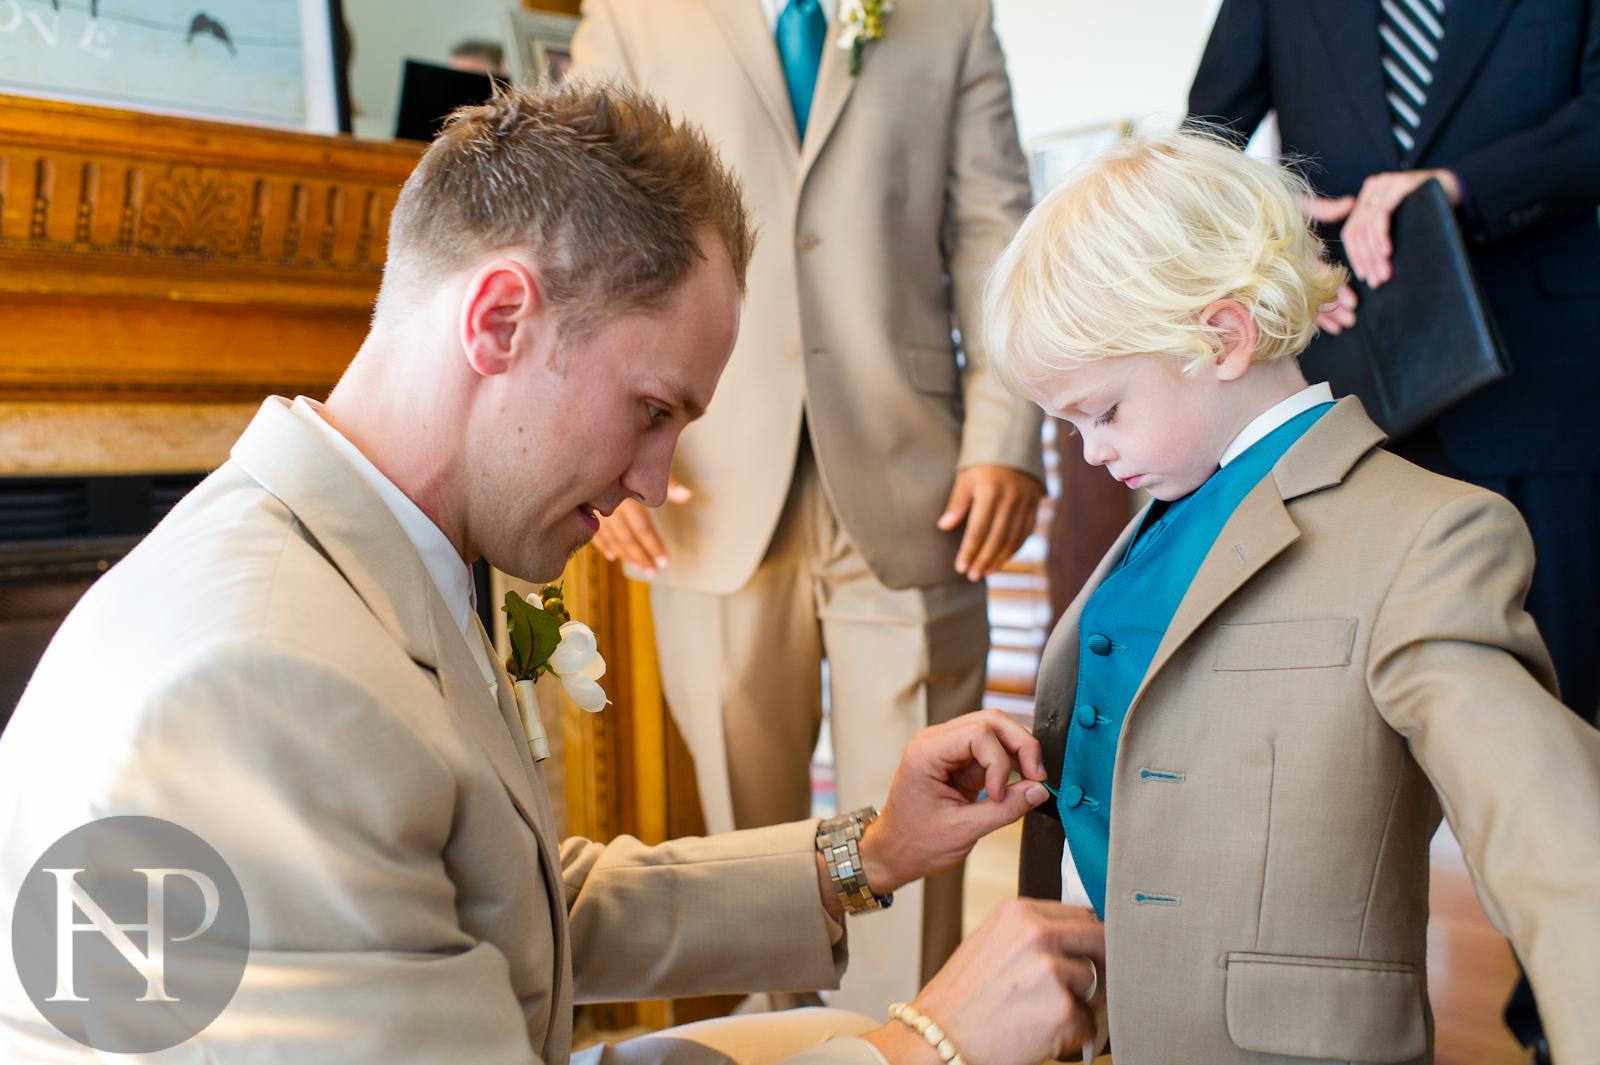 wedding photography dc photographer - district of columbia photography weddingphoto 2012_ denis kaleigh - north carolina - emerald isle - destination wedding-24.jpg